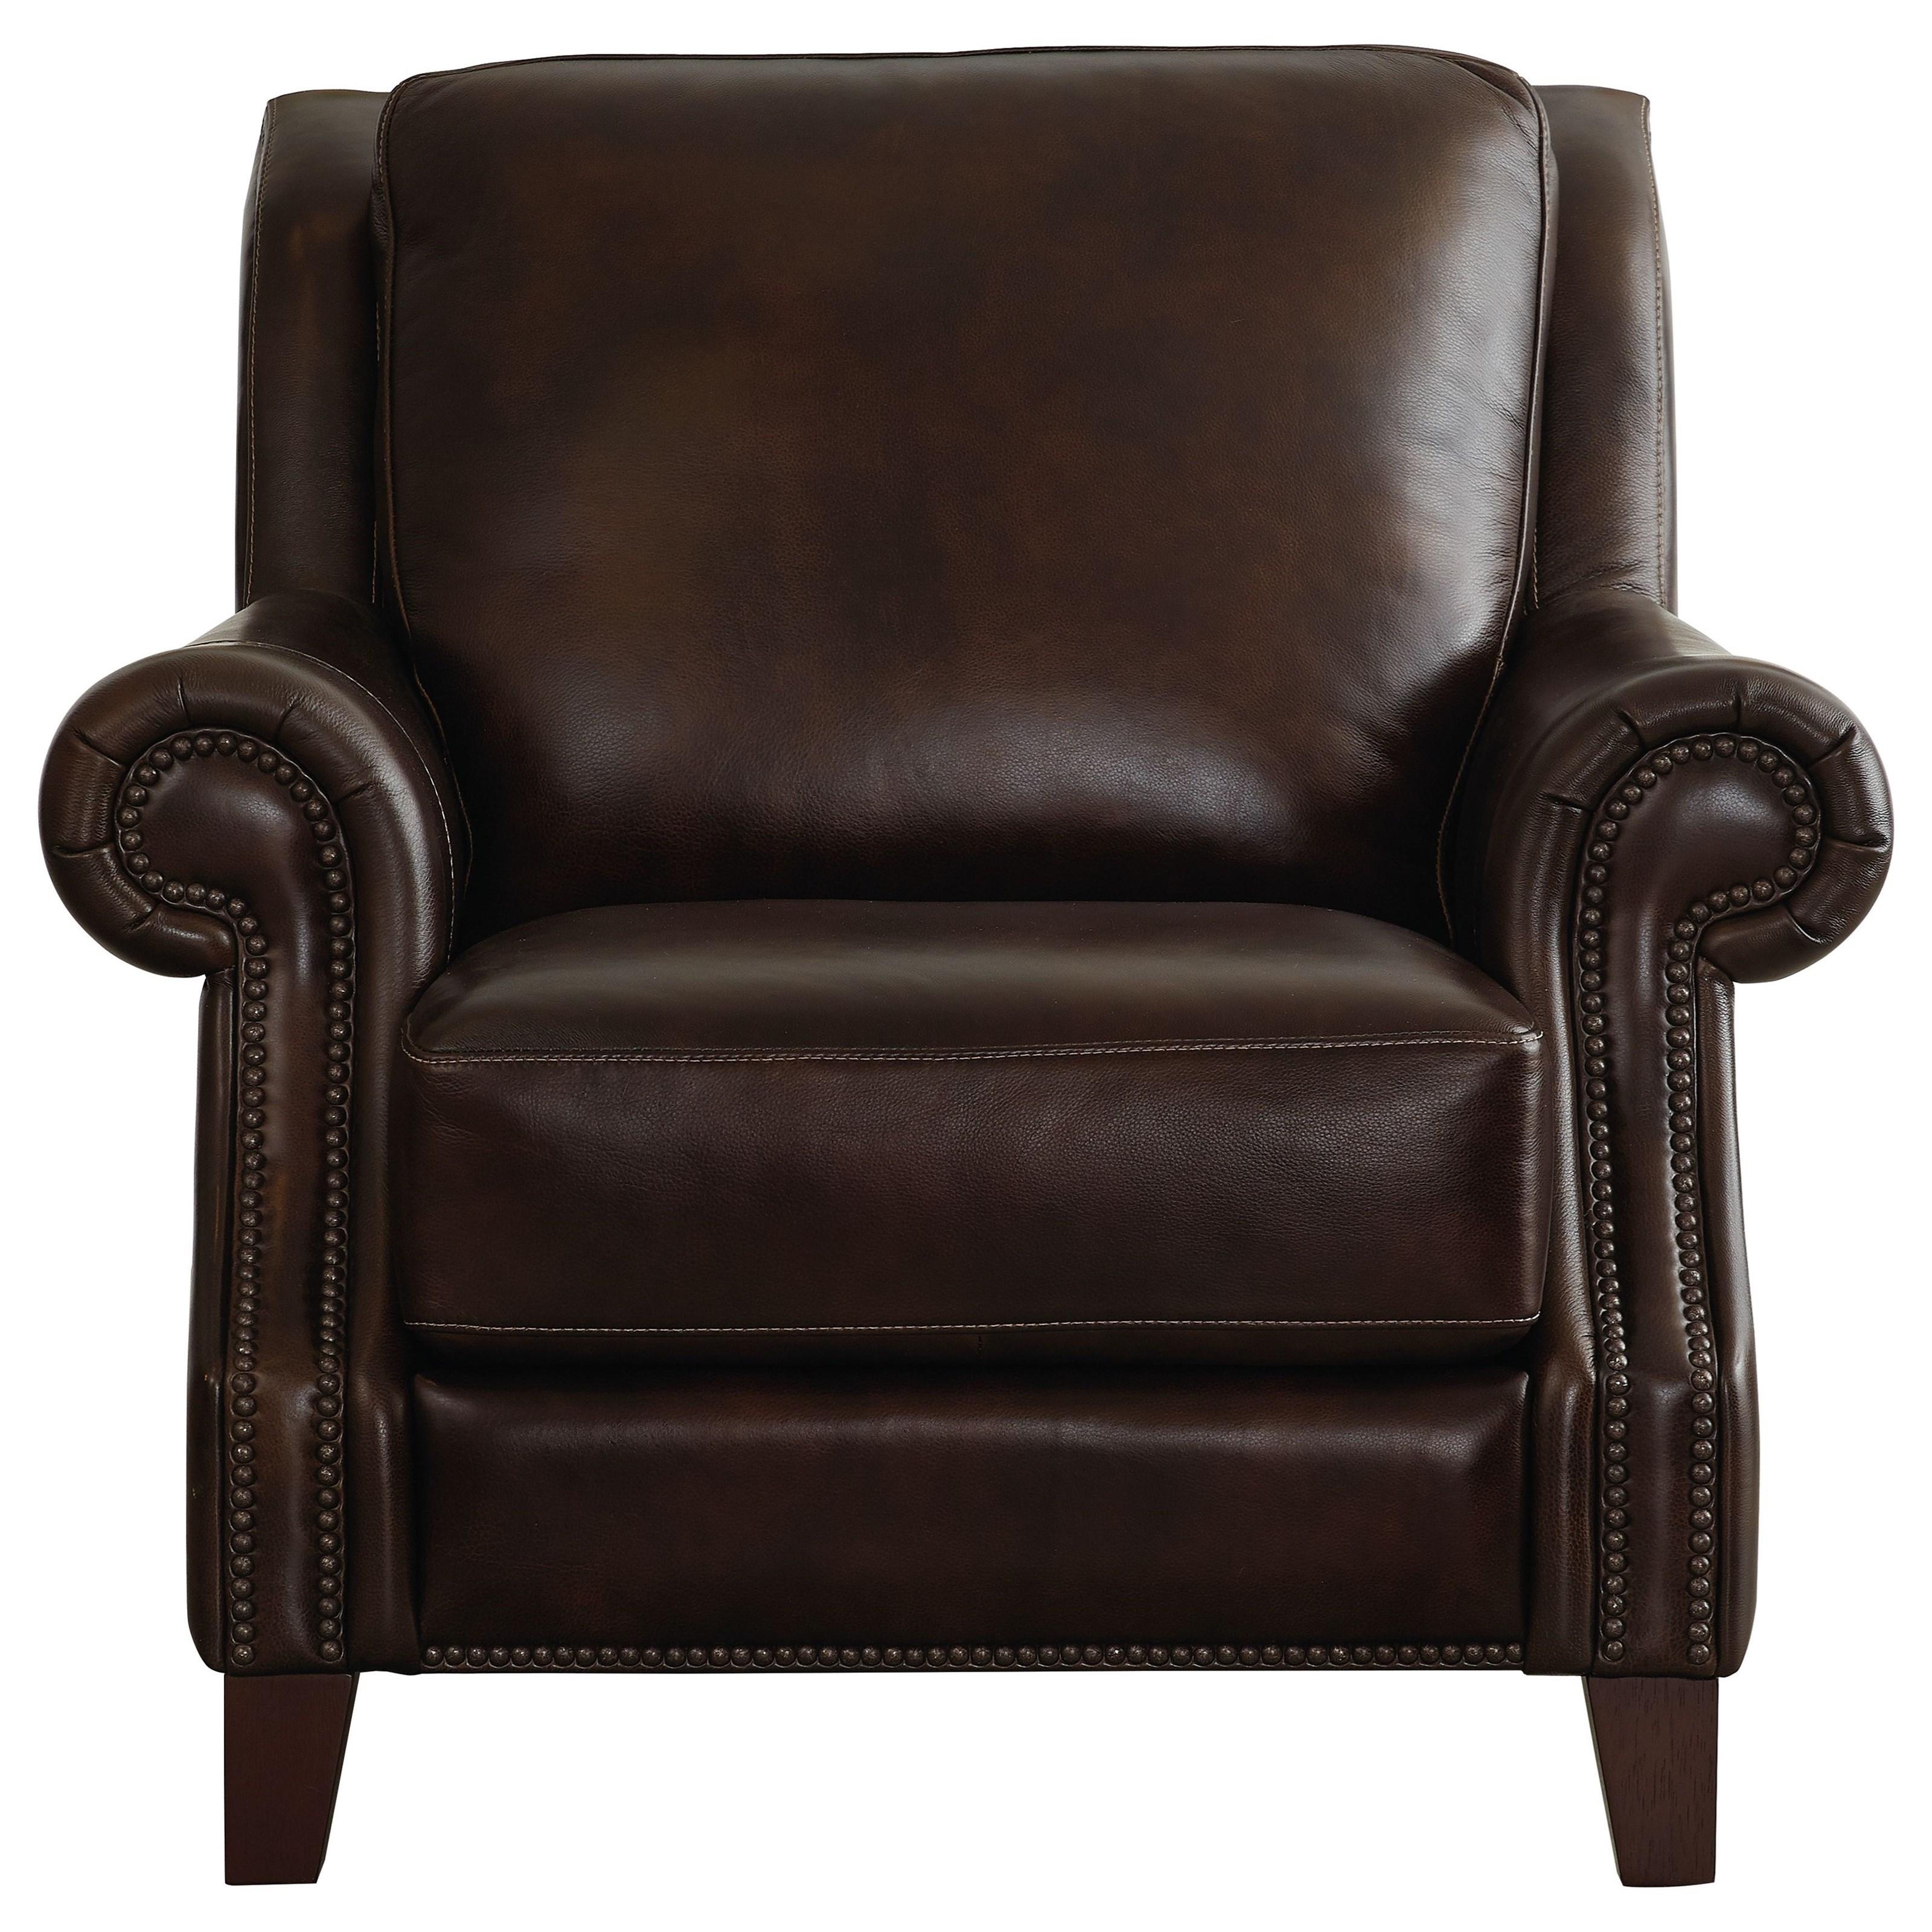 Pierce Chair by Bassett at Bassett of Cool Springs